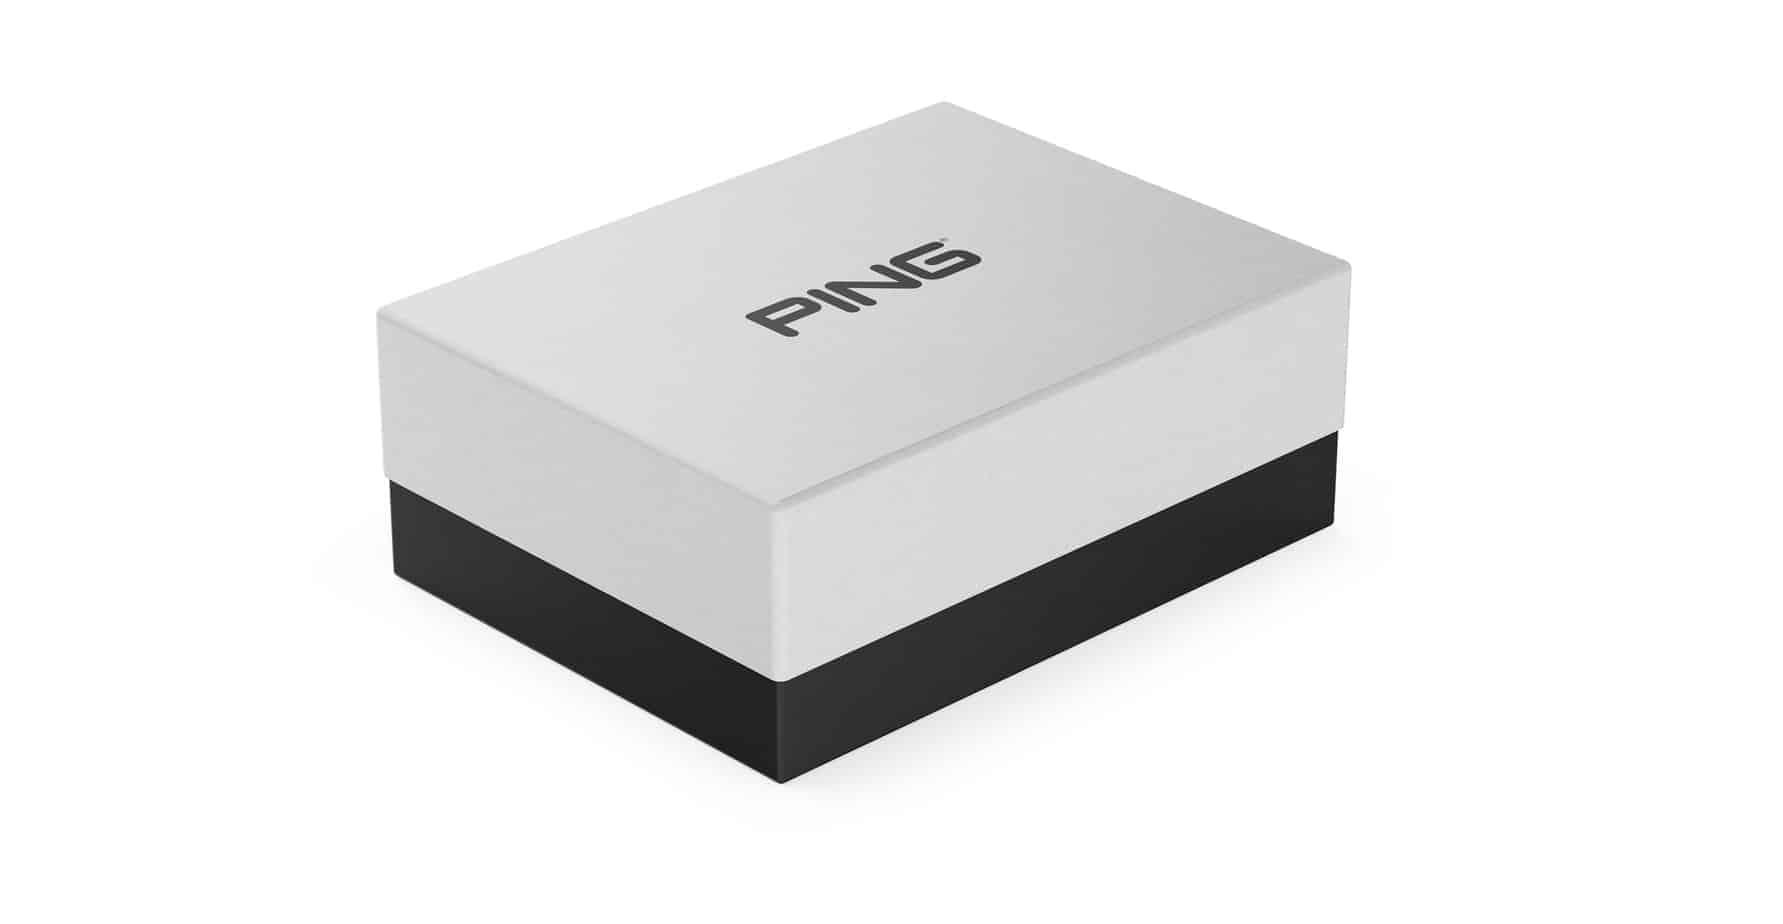 Ping Custom Shoe Boxes